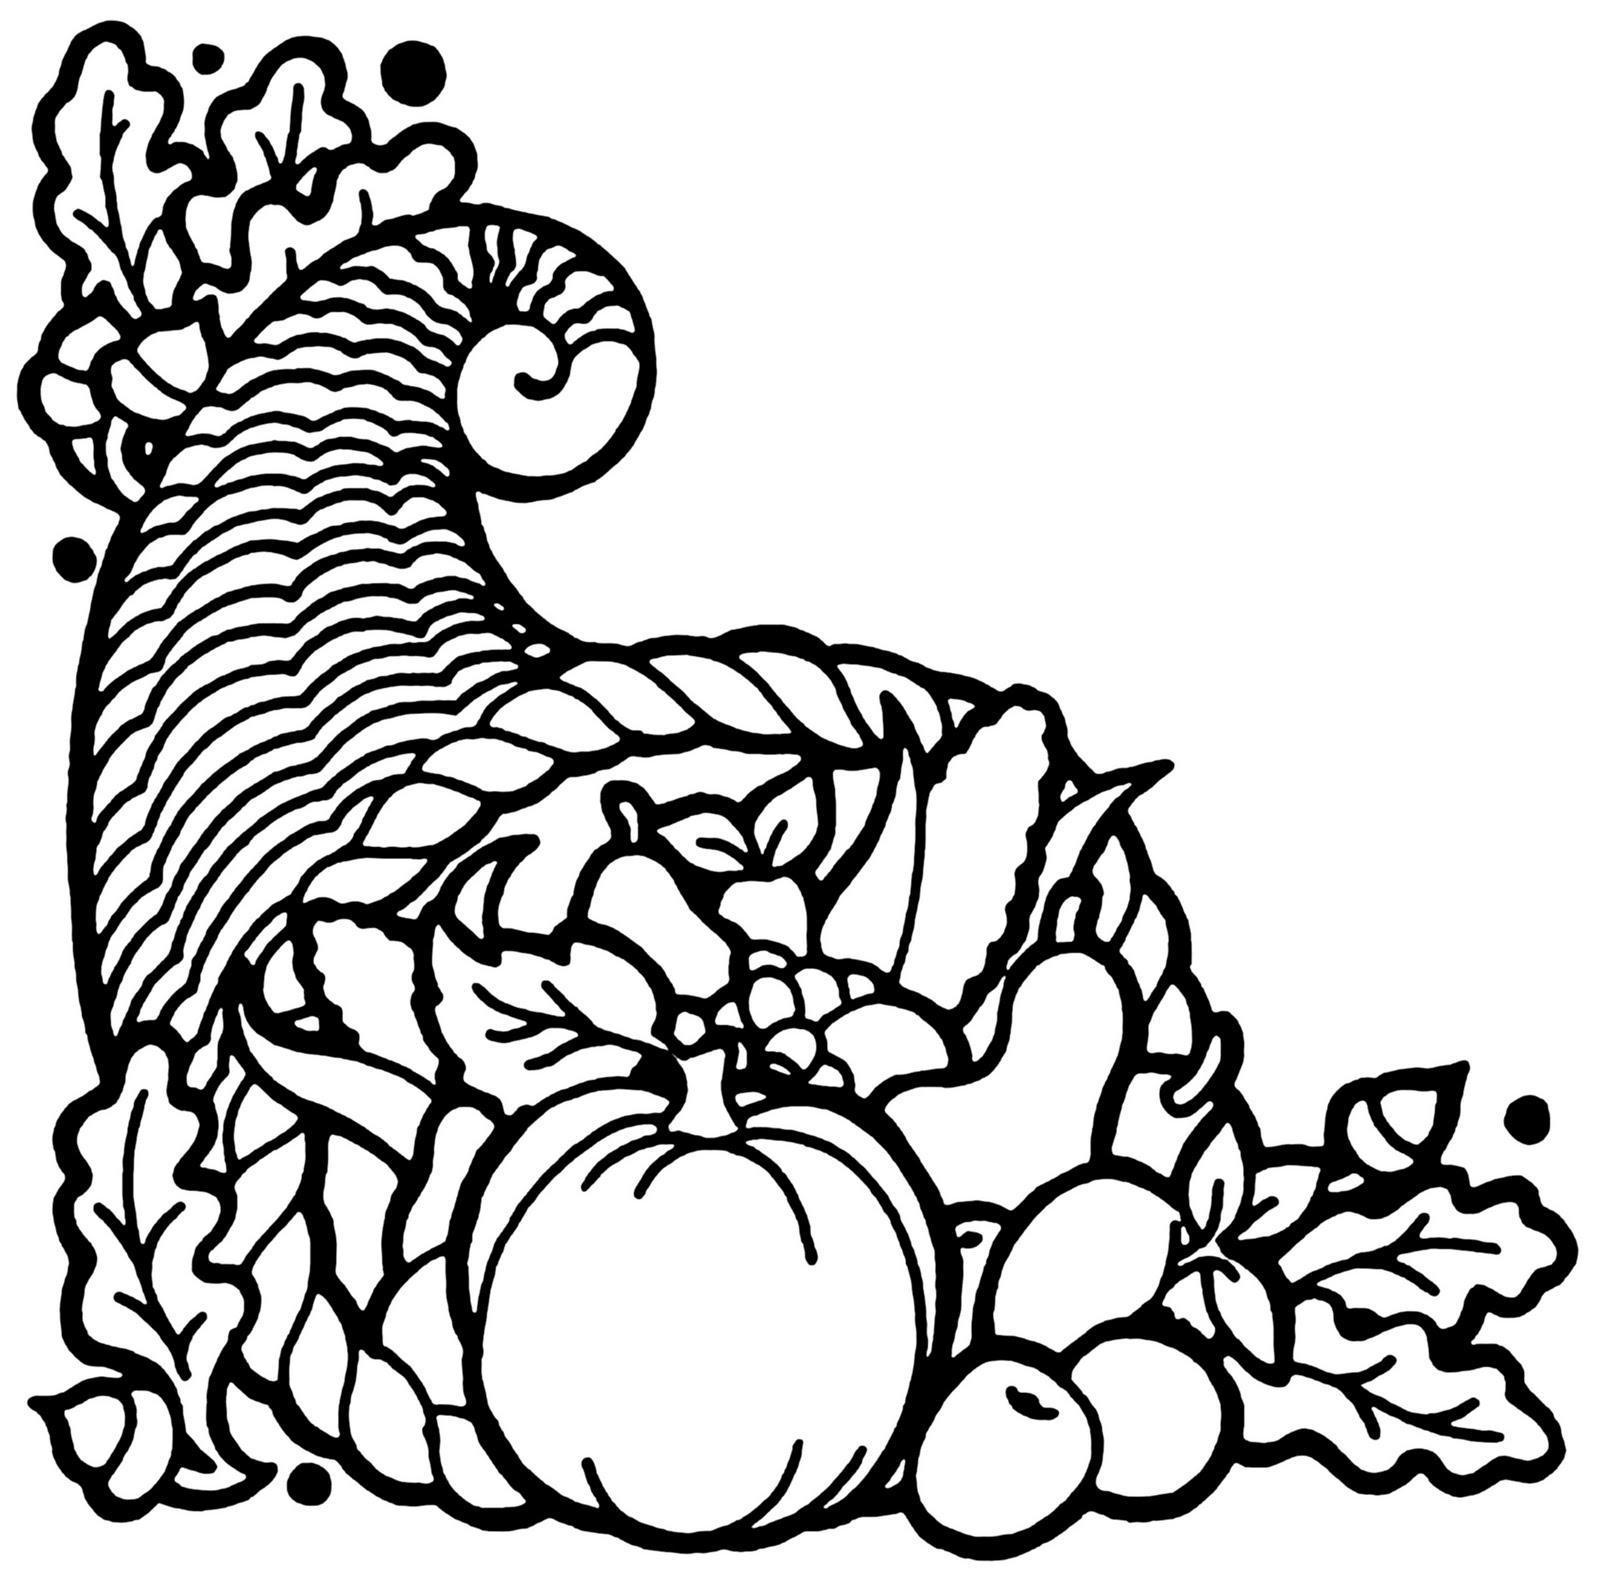 1600x1575 Cornucopia Clip Art Free Clipart Images 6 Wikiclipart 2